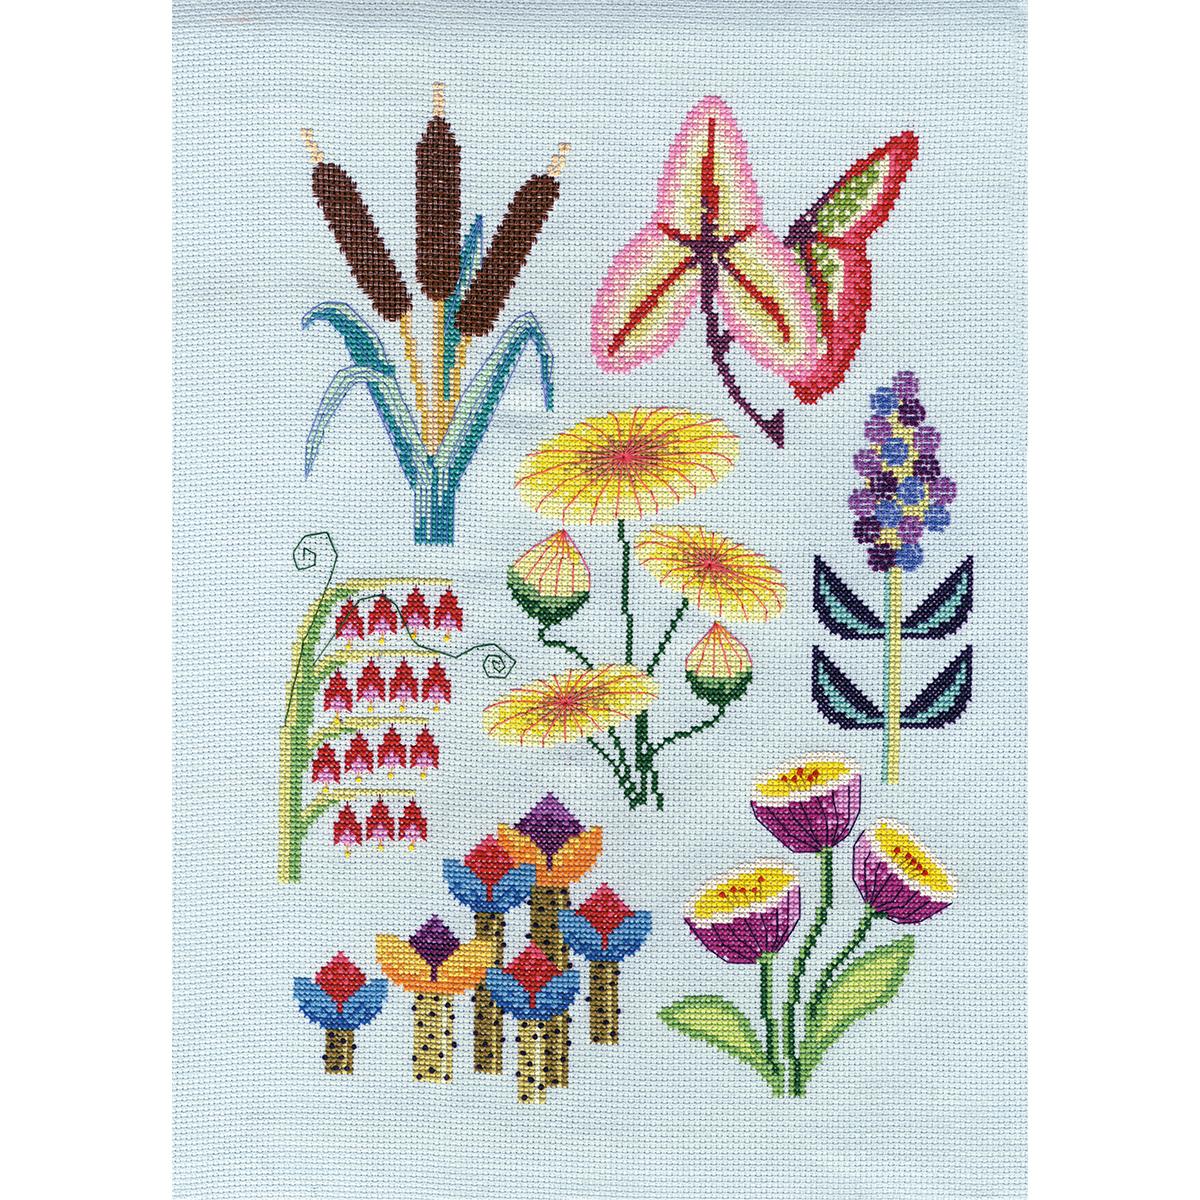 Seaside botanical cross stitch kit by Emily Peacock